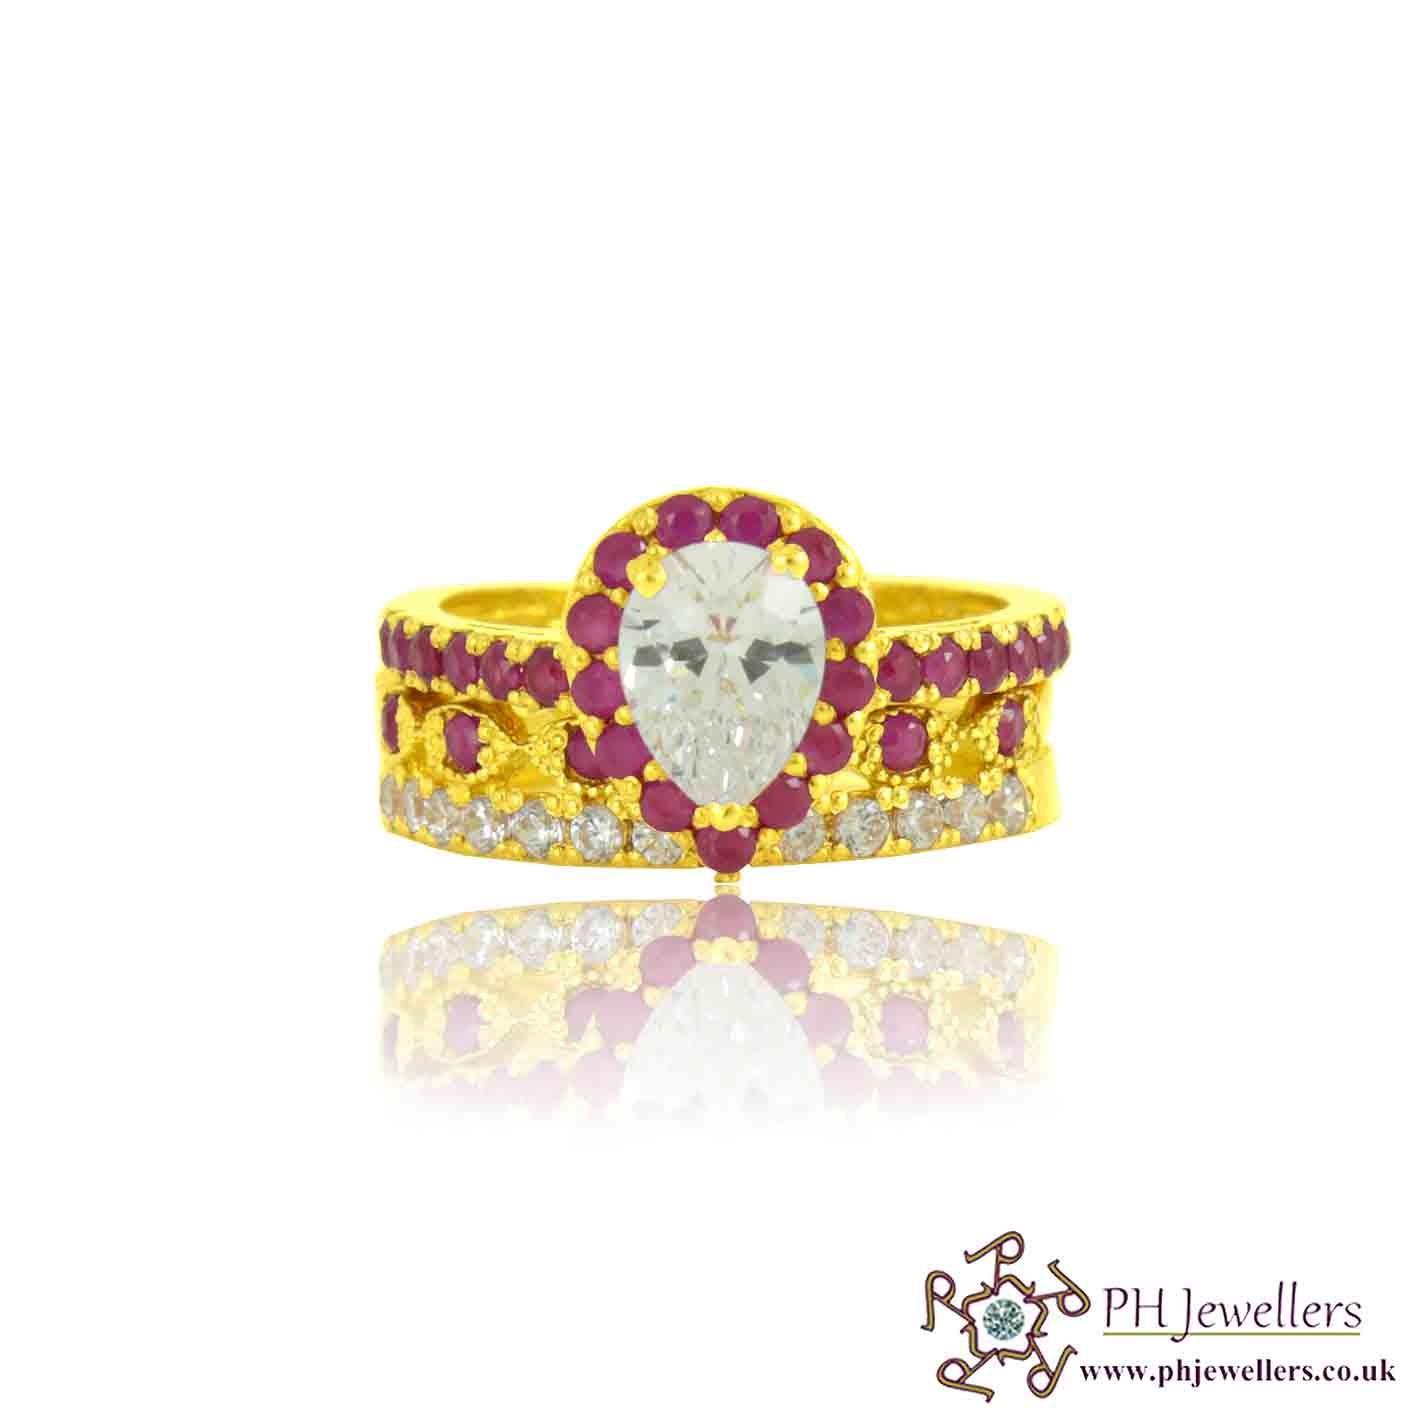 Online Gold Jewellery Gold Jewellery 22ct 916 Hallmark Yellow Gold